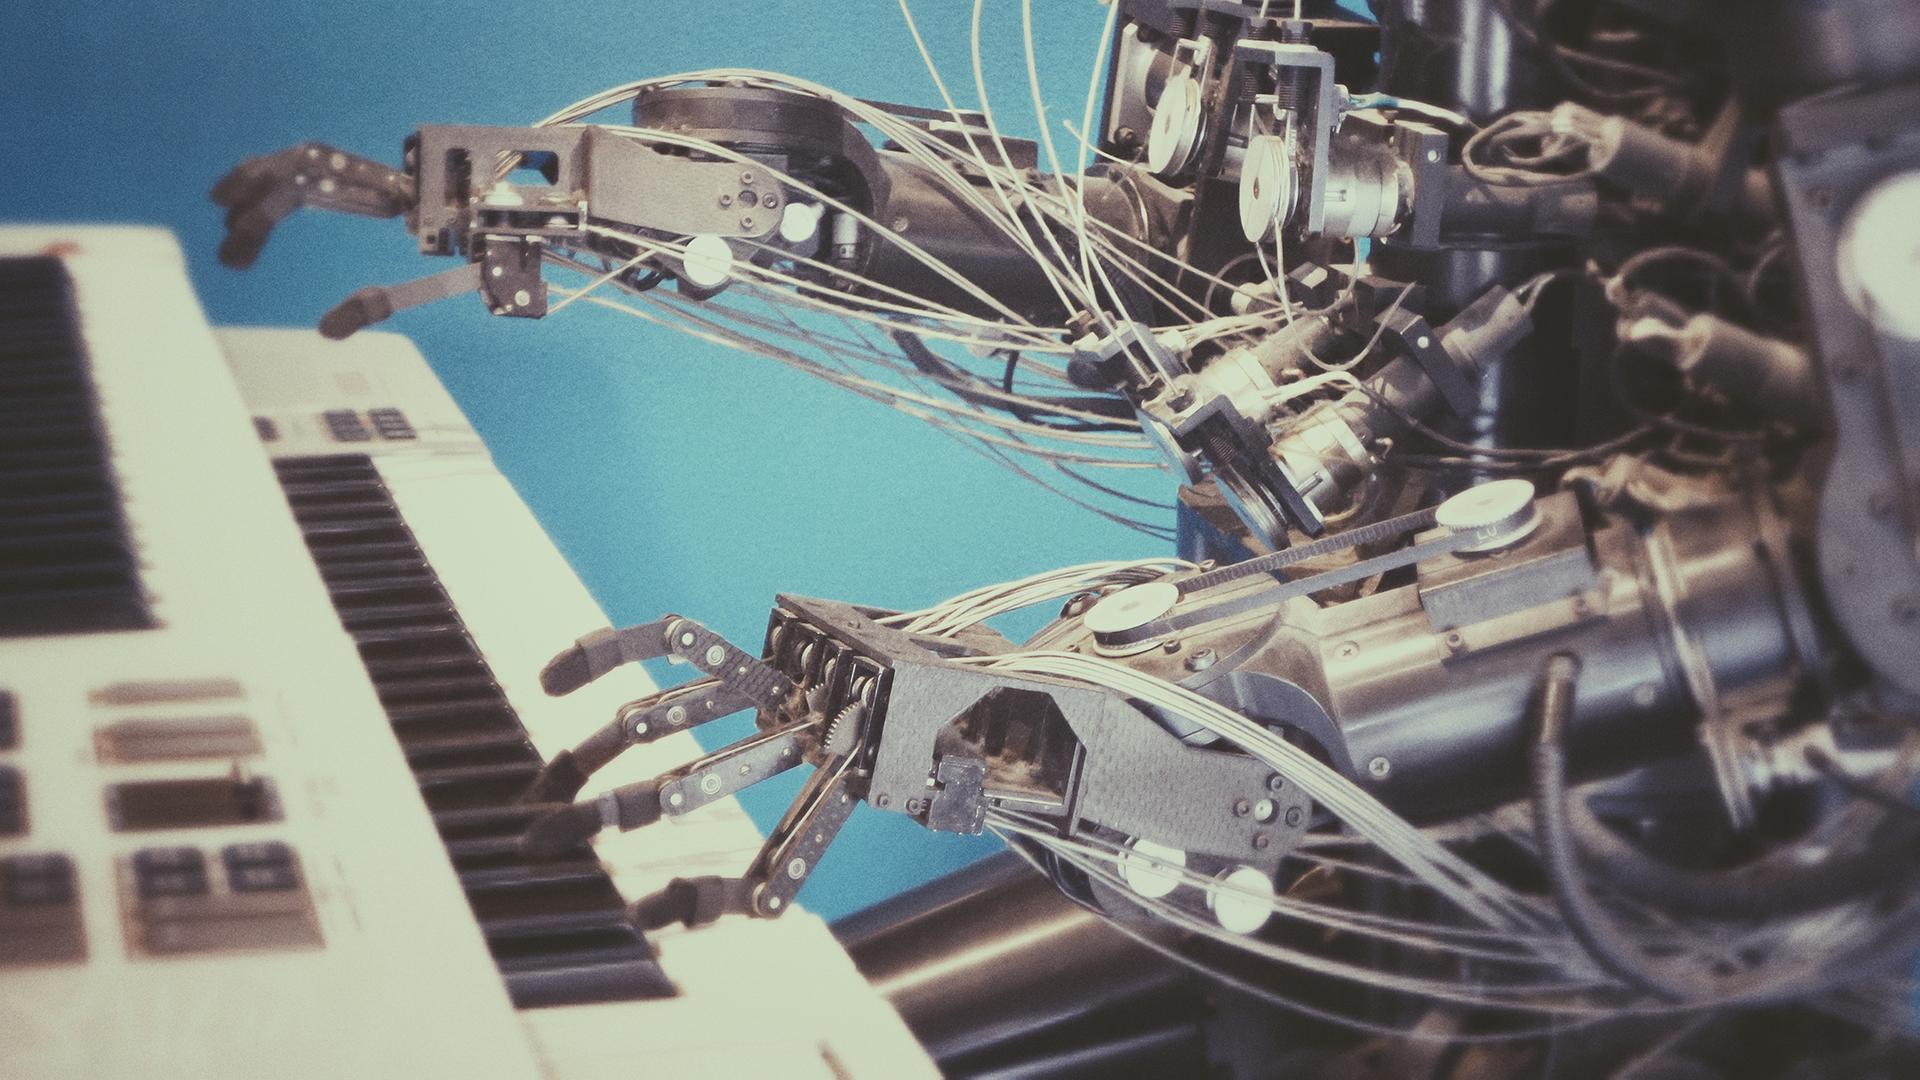 Robot alla tastiera Photo by Franck Veschi on Unsplash